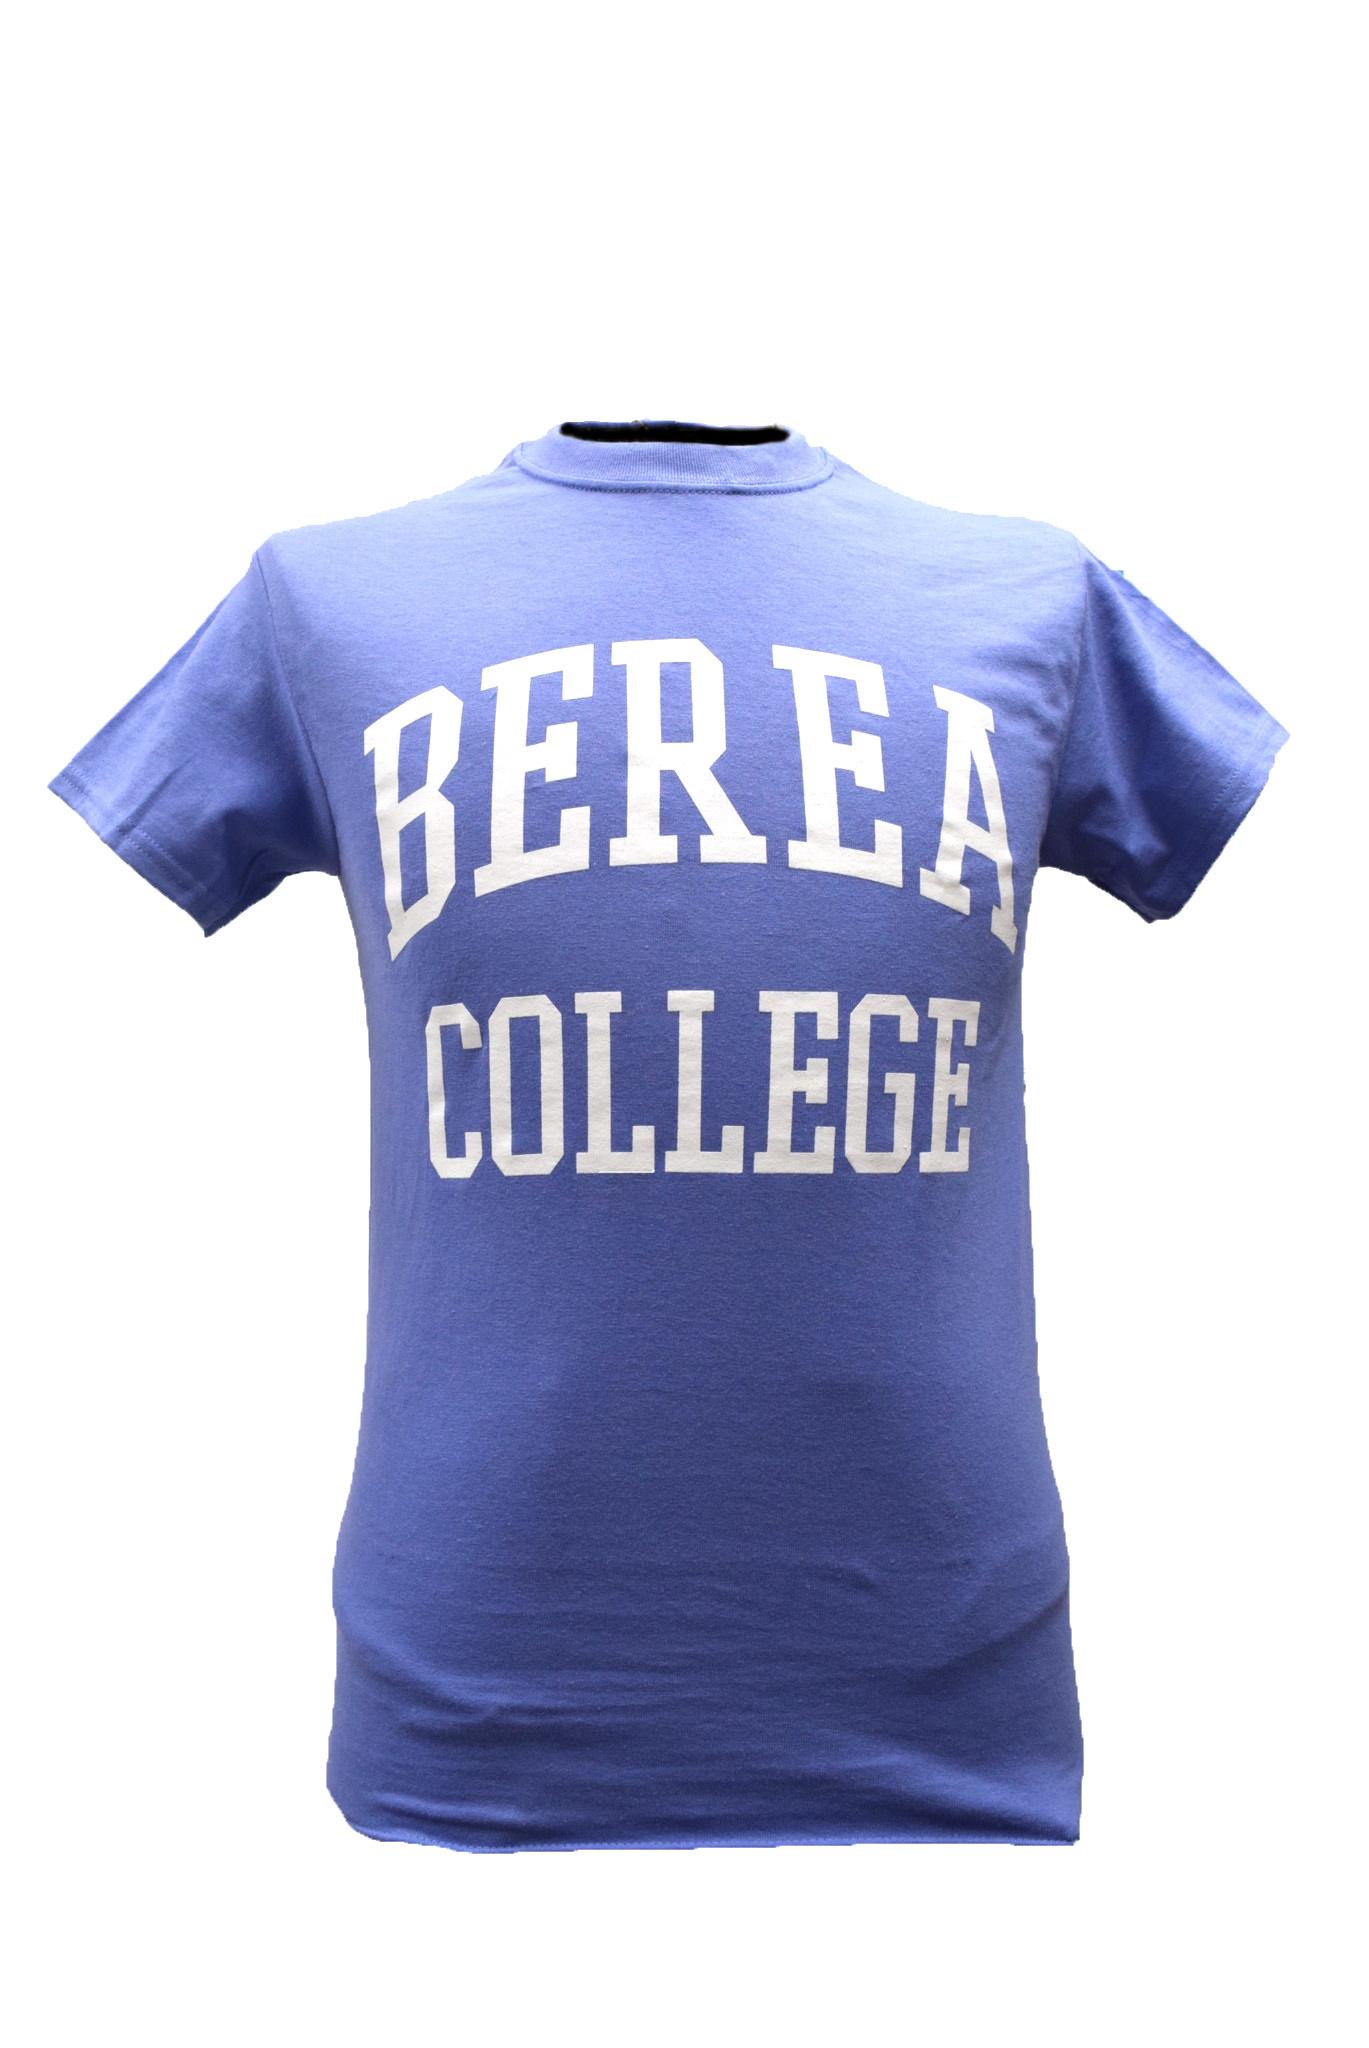 Berea College Classic T- Shirt-7